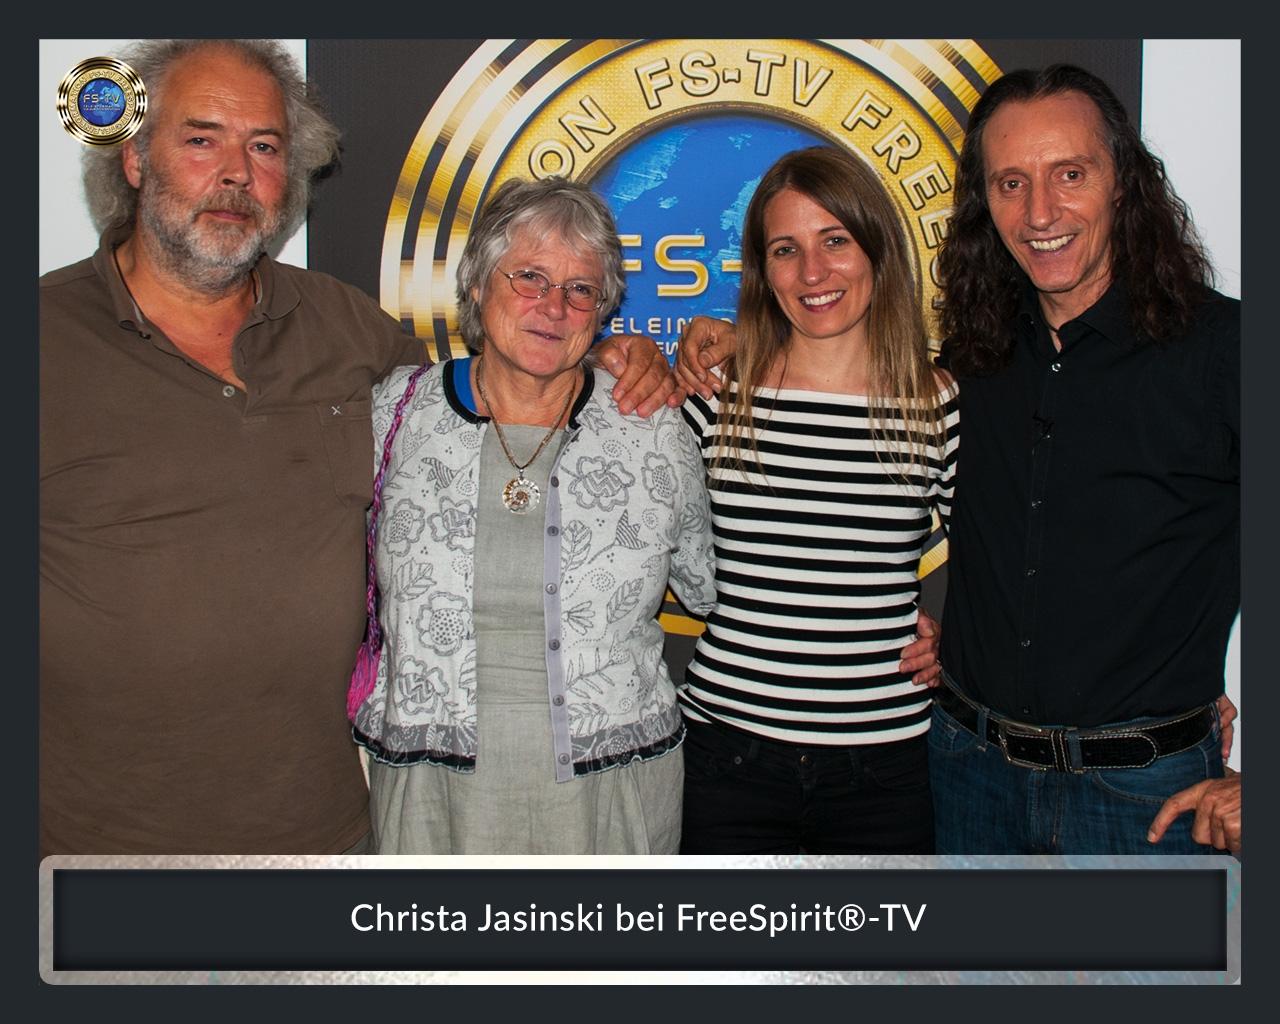 FS-TV-Bildergallerie-Christa-Jasinski